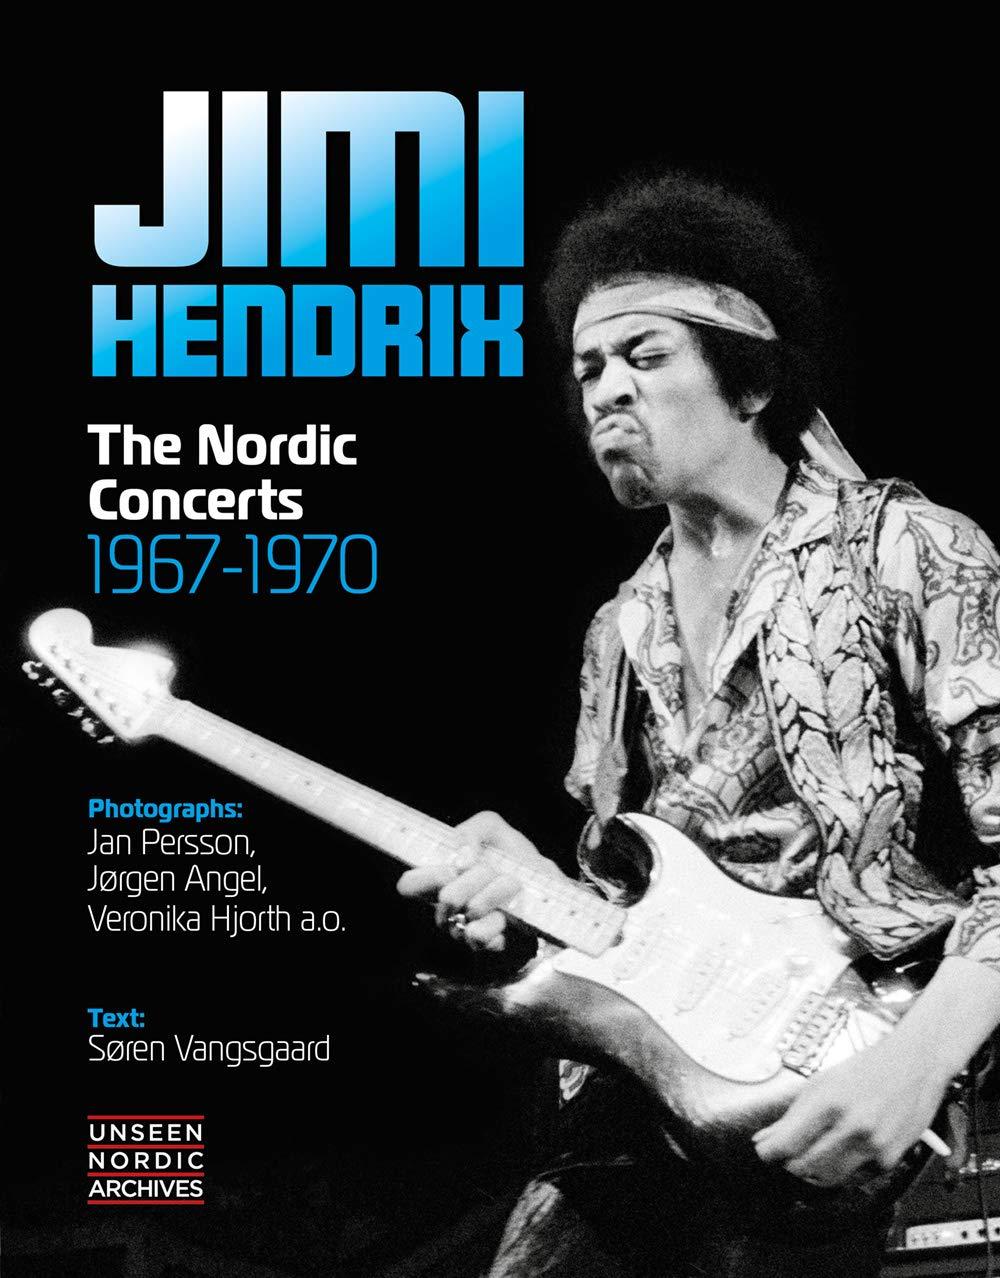 Jimi Hendrix - The Nordic Concerts 1967-1970 (Soren Vangsgaard) [2019] 71SMuhaFFgL